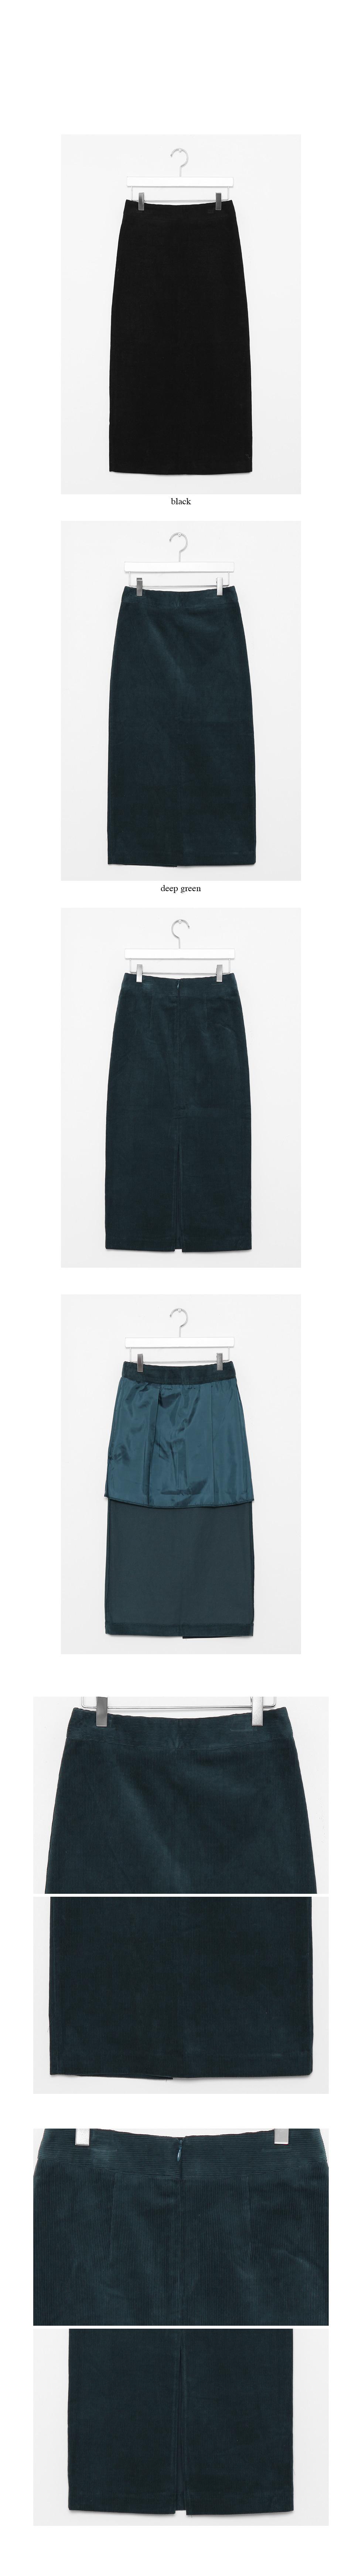 corduroy formal skirts